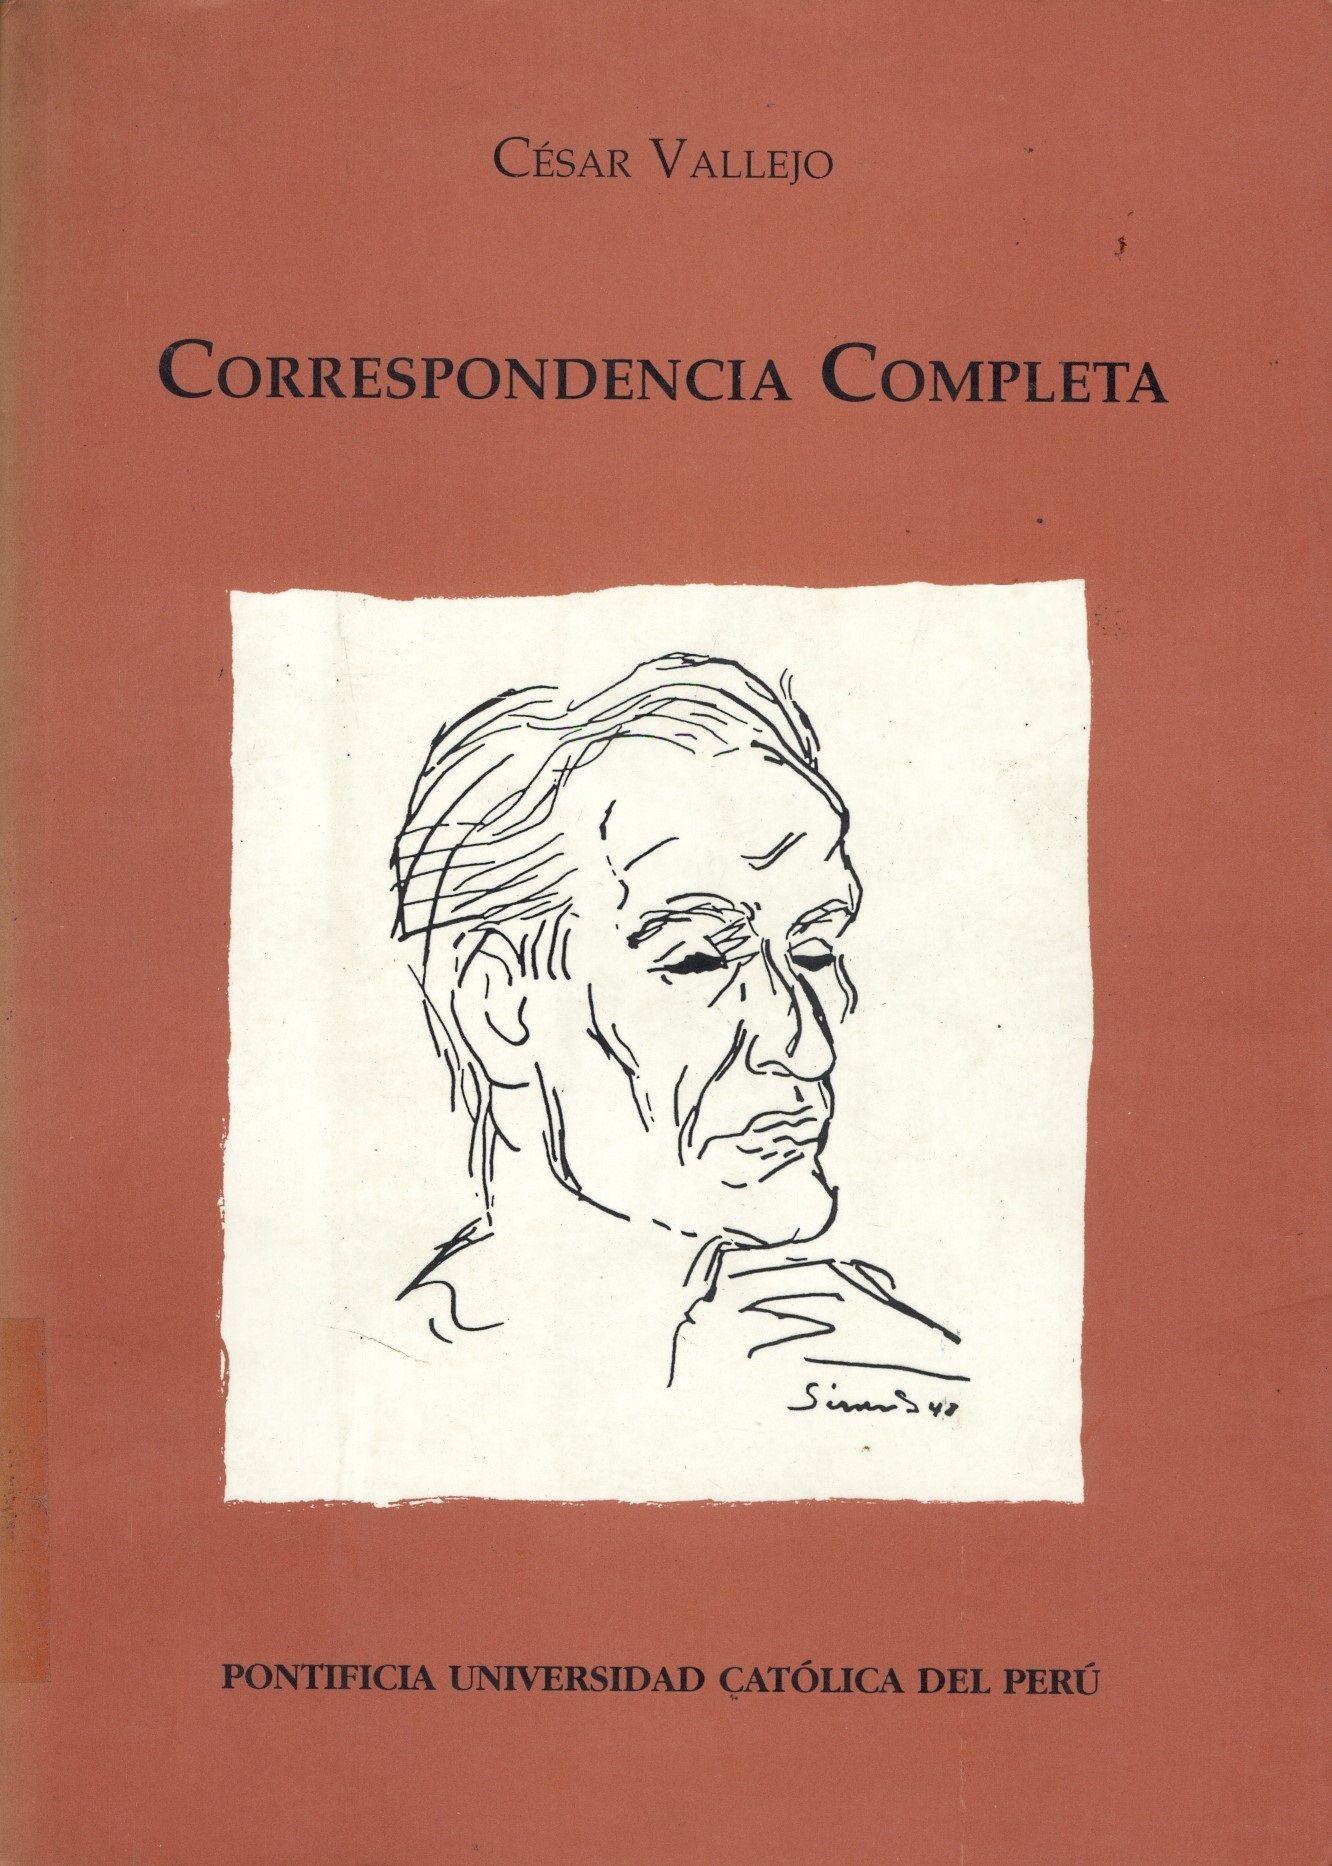 César Vallejo Correspondencia completa / PQ 8497.V35